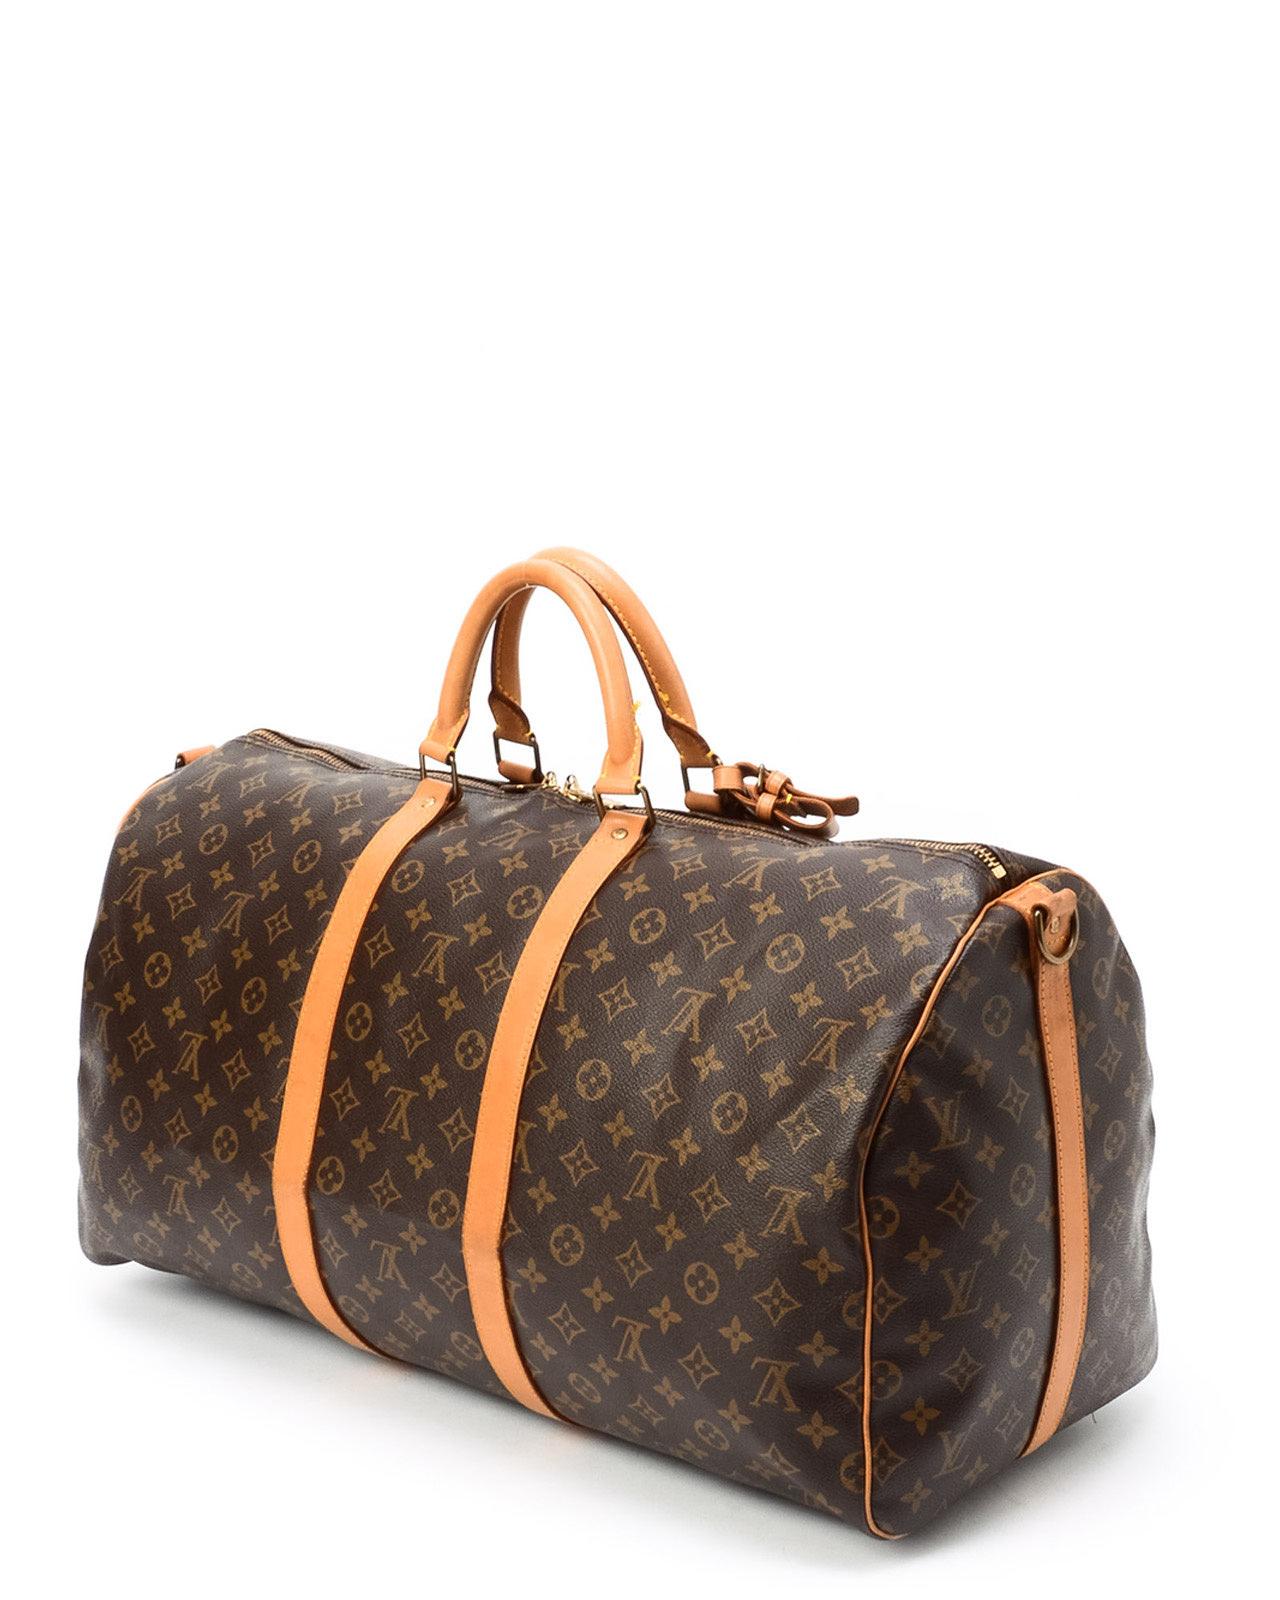 lyst louis vuitton monogram keepall 55 bandou travel bag in metallic. Black Bedroom Furniture Sets. Home Design Ideas